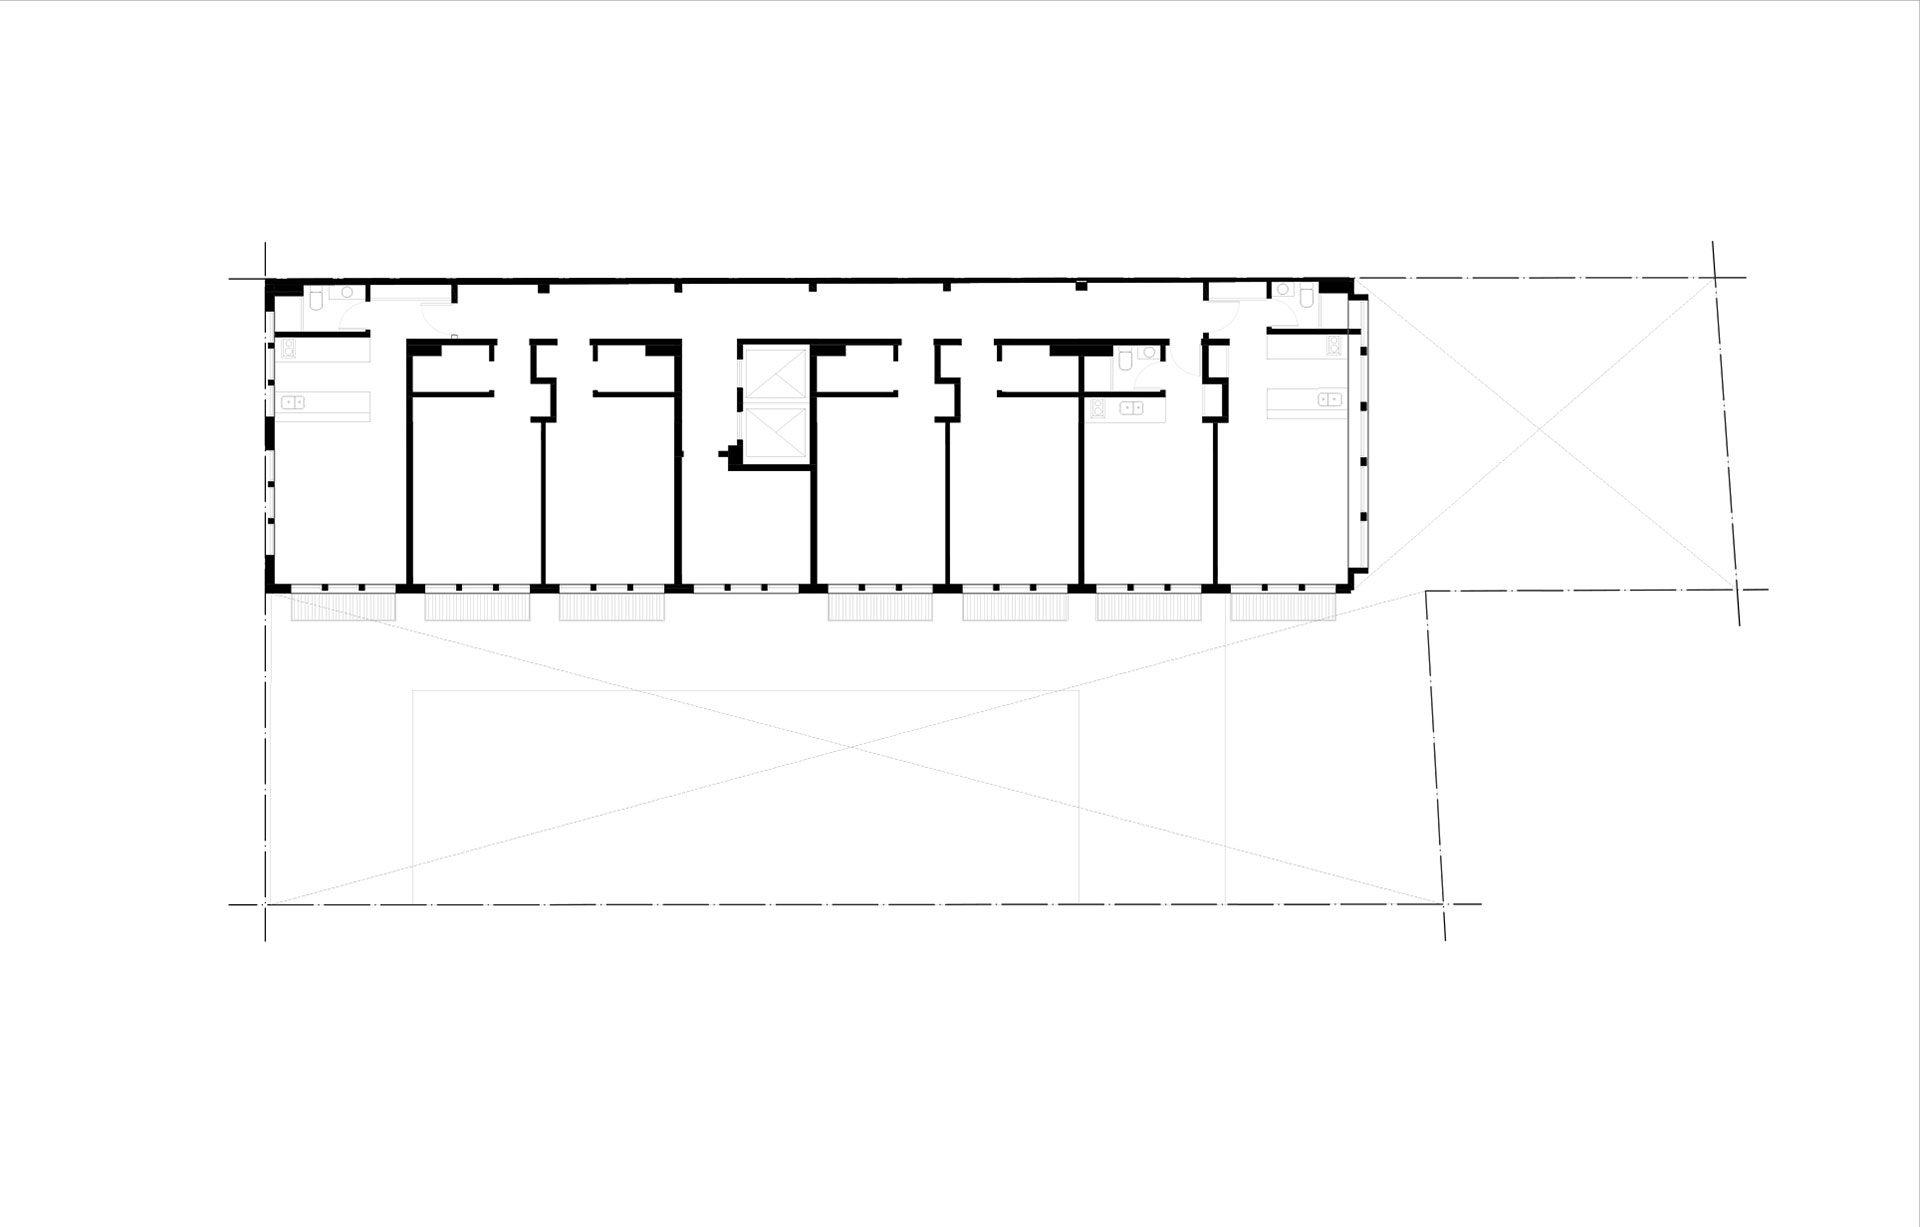 PACHECO-3172---PLANTAS-3-TIPO